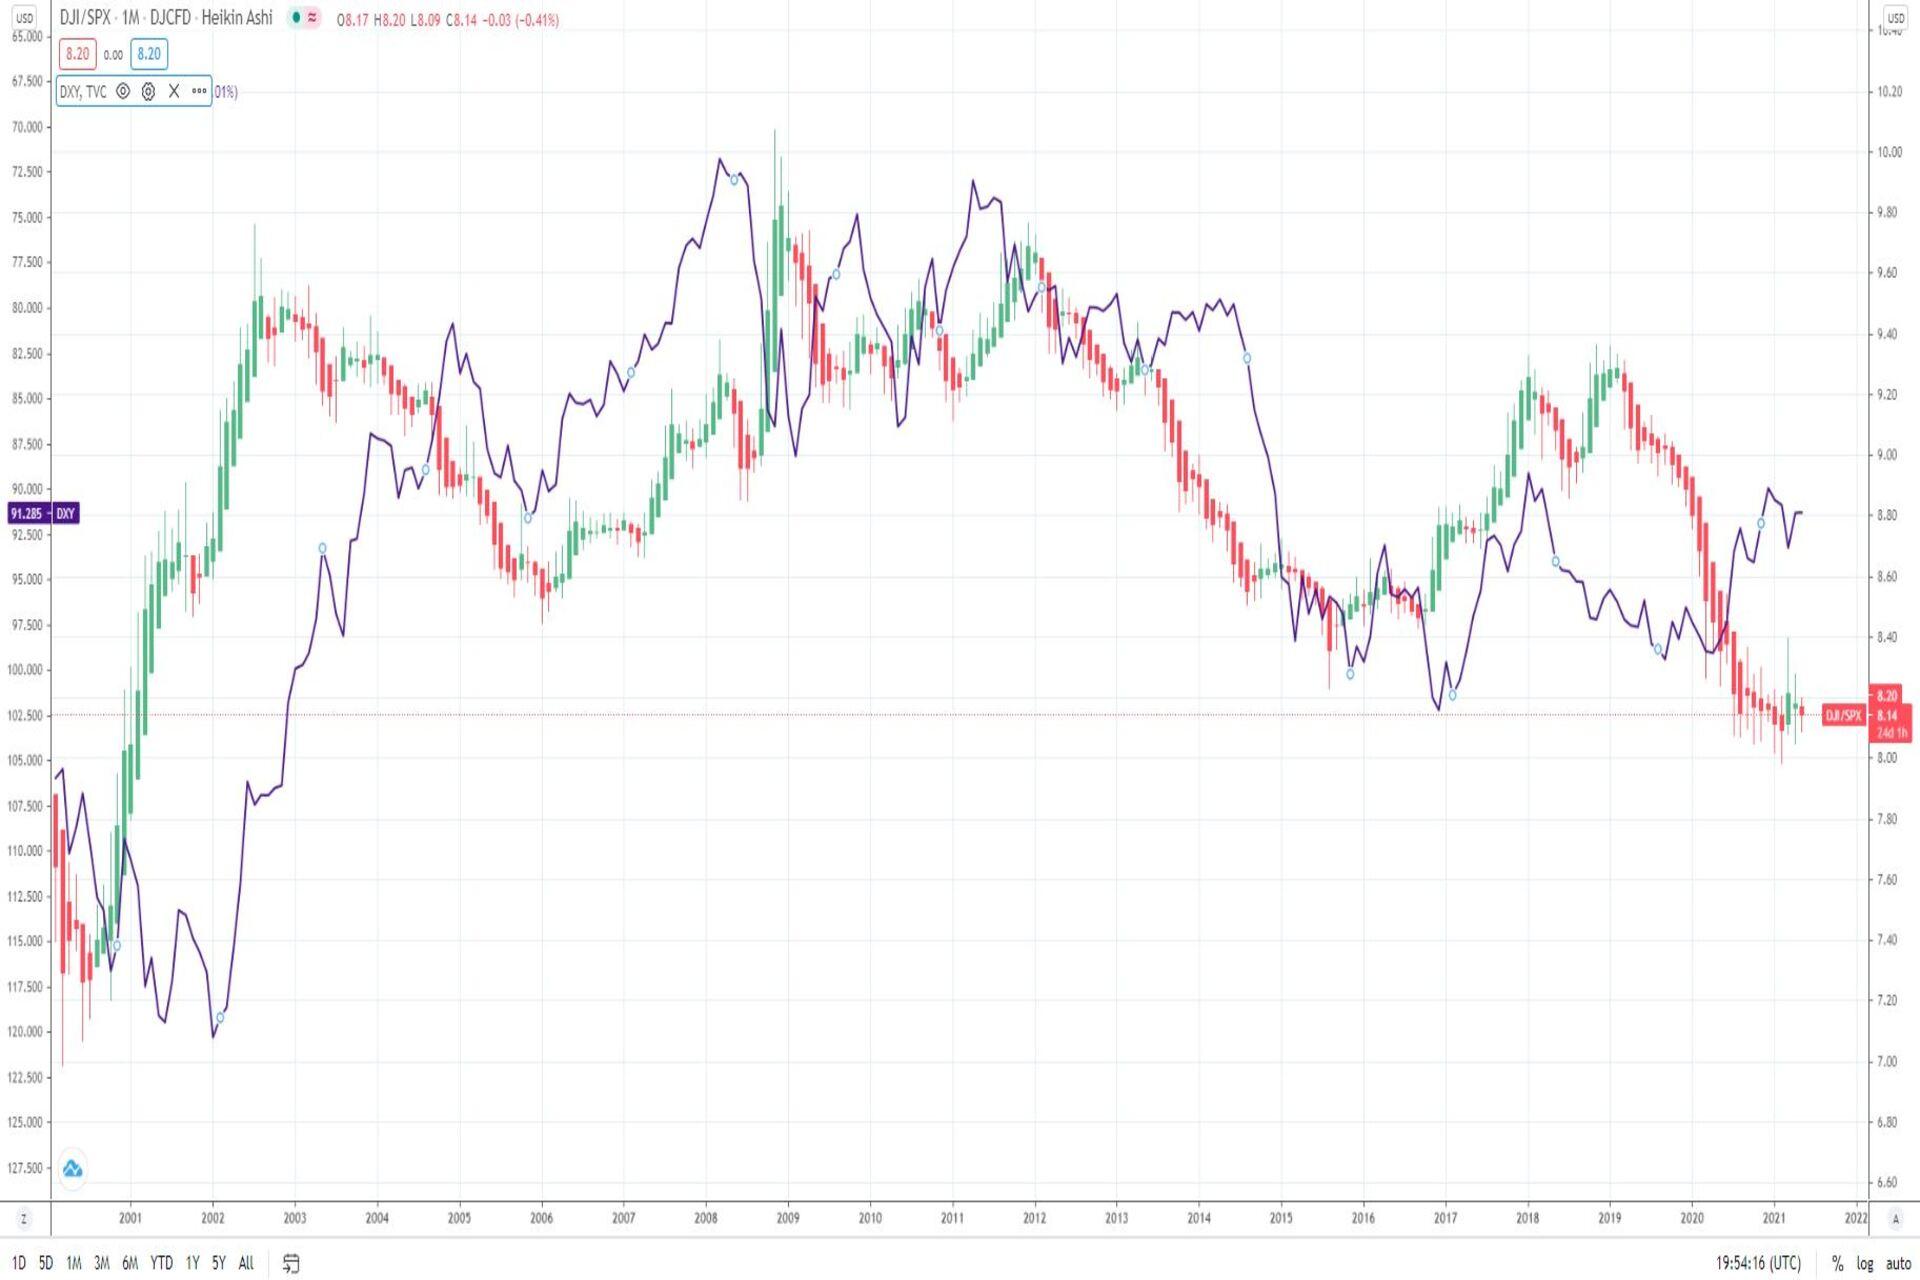 Dow/SP500 ratio vs the Dollar Index